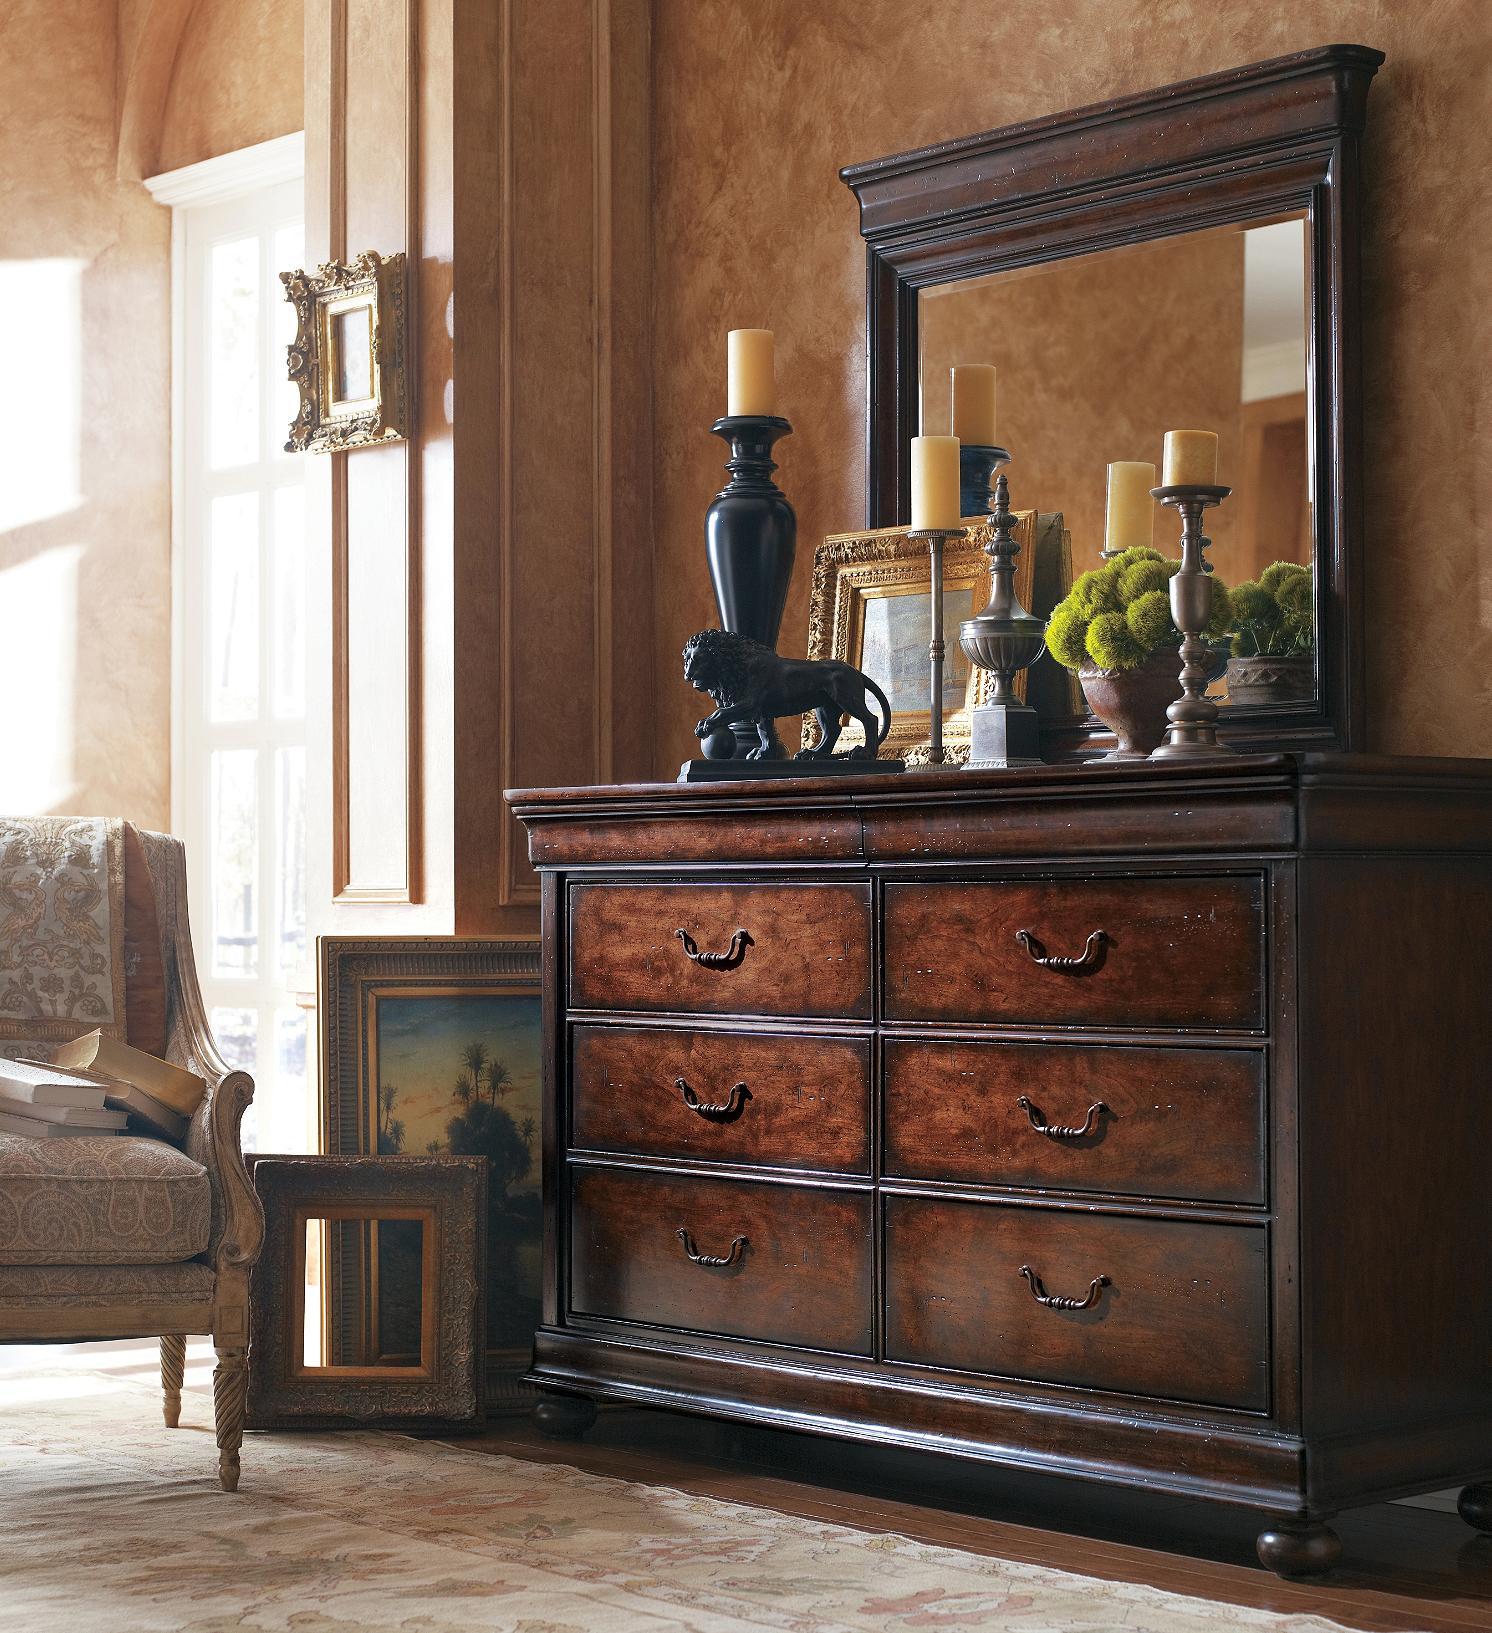 Stanley furniture the classic portfolio louis philippe for Classic furniture jacksonville fl